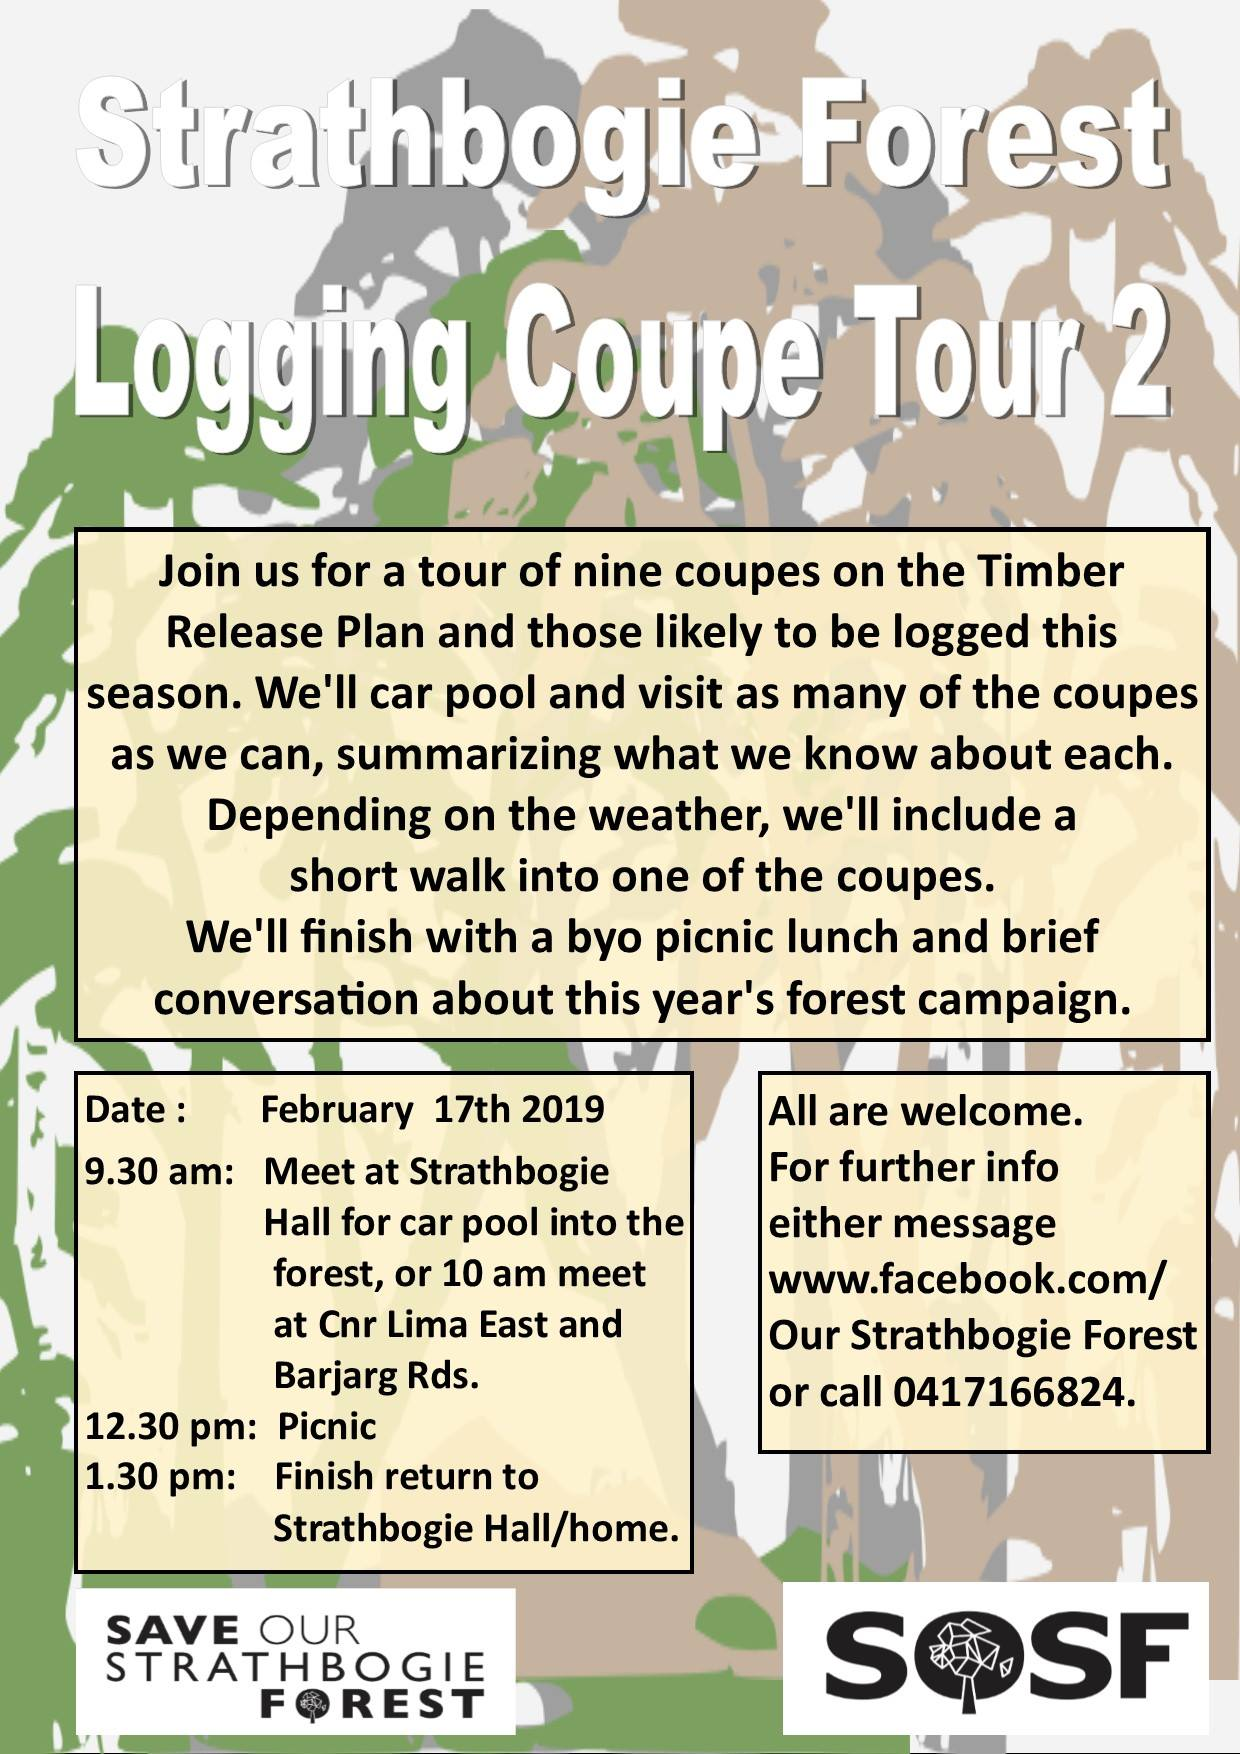 Strathbogie coupe tour 2